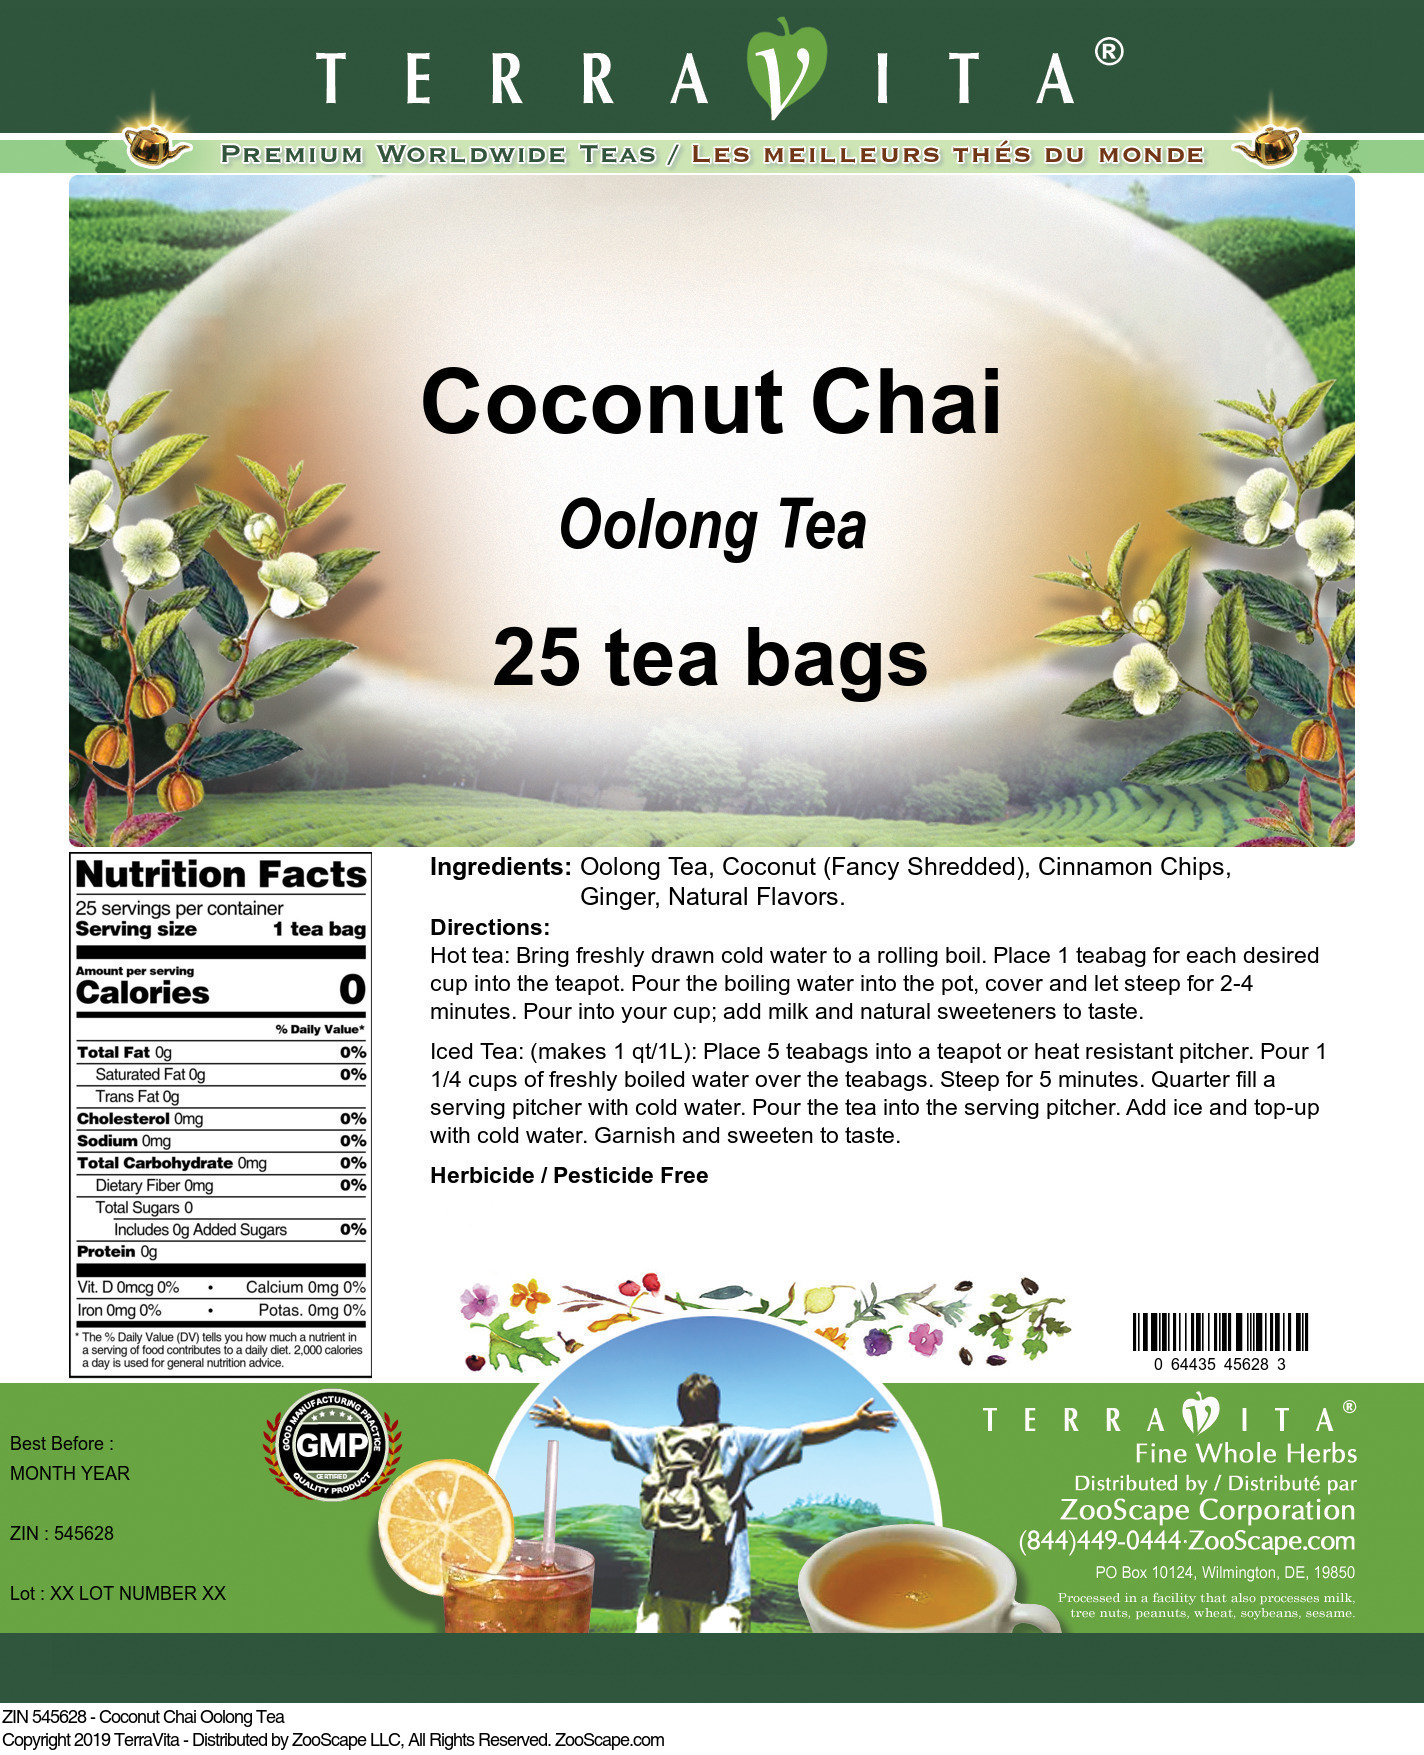 Coconut Chai Oolong Tea